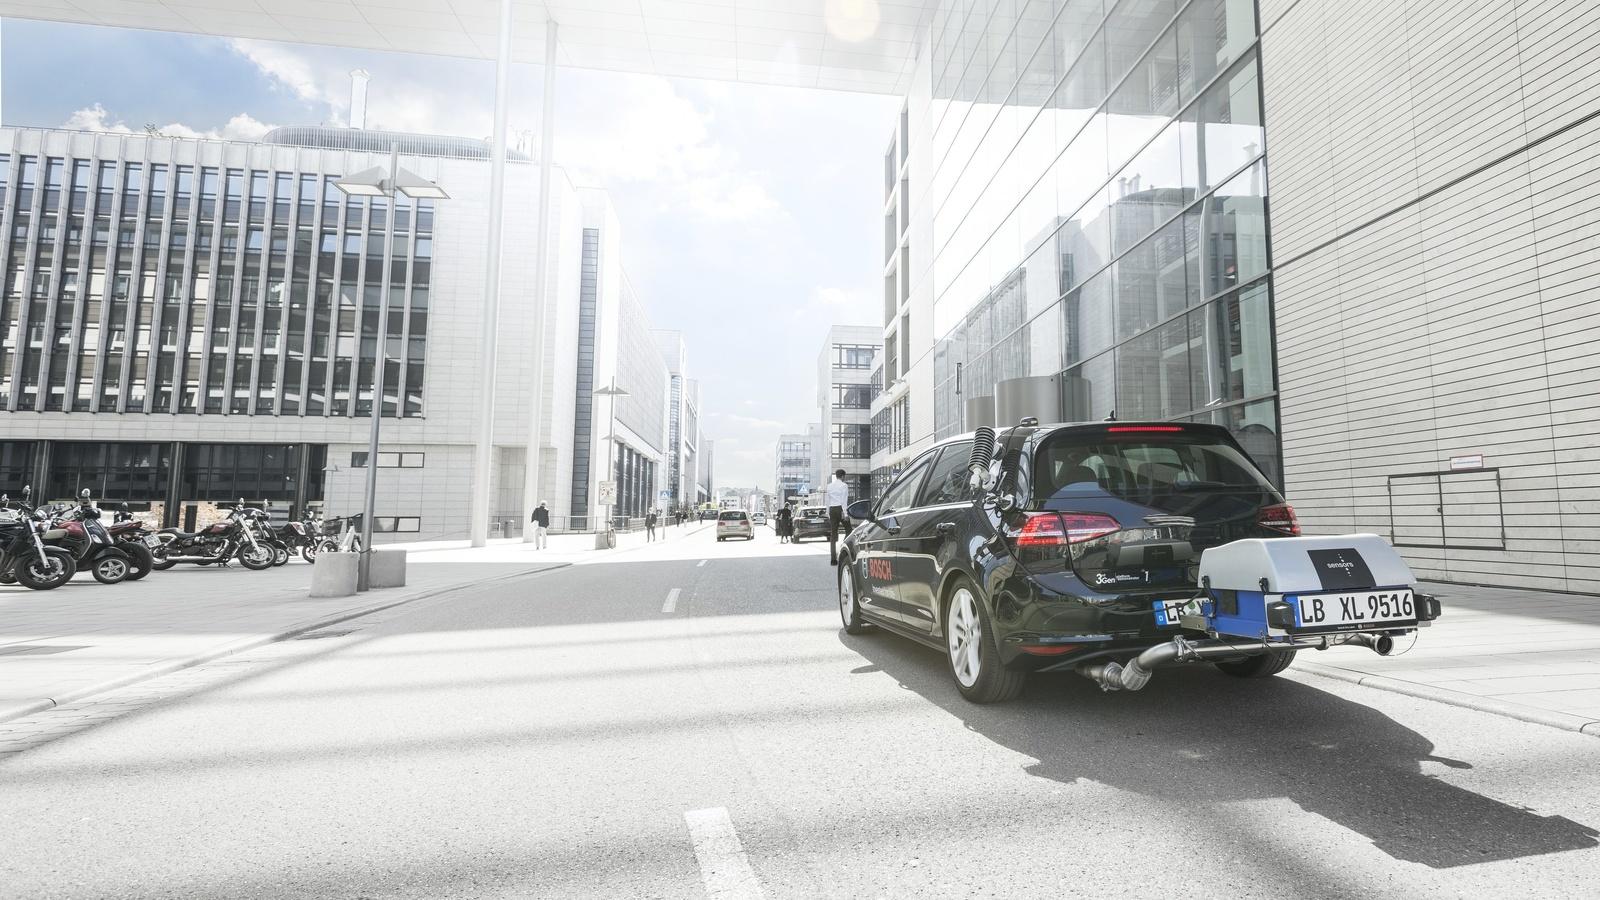 IAA 2019: Bosch wins electromobility orders amounting to 13 billion euros